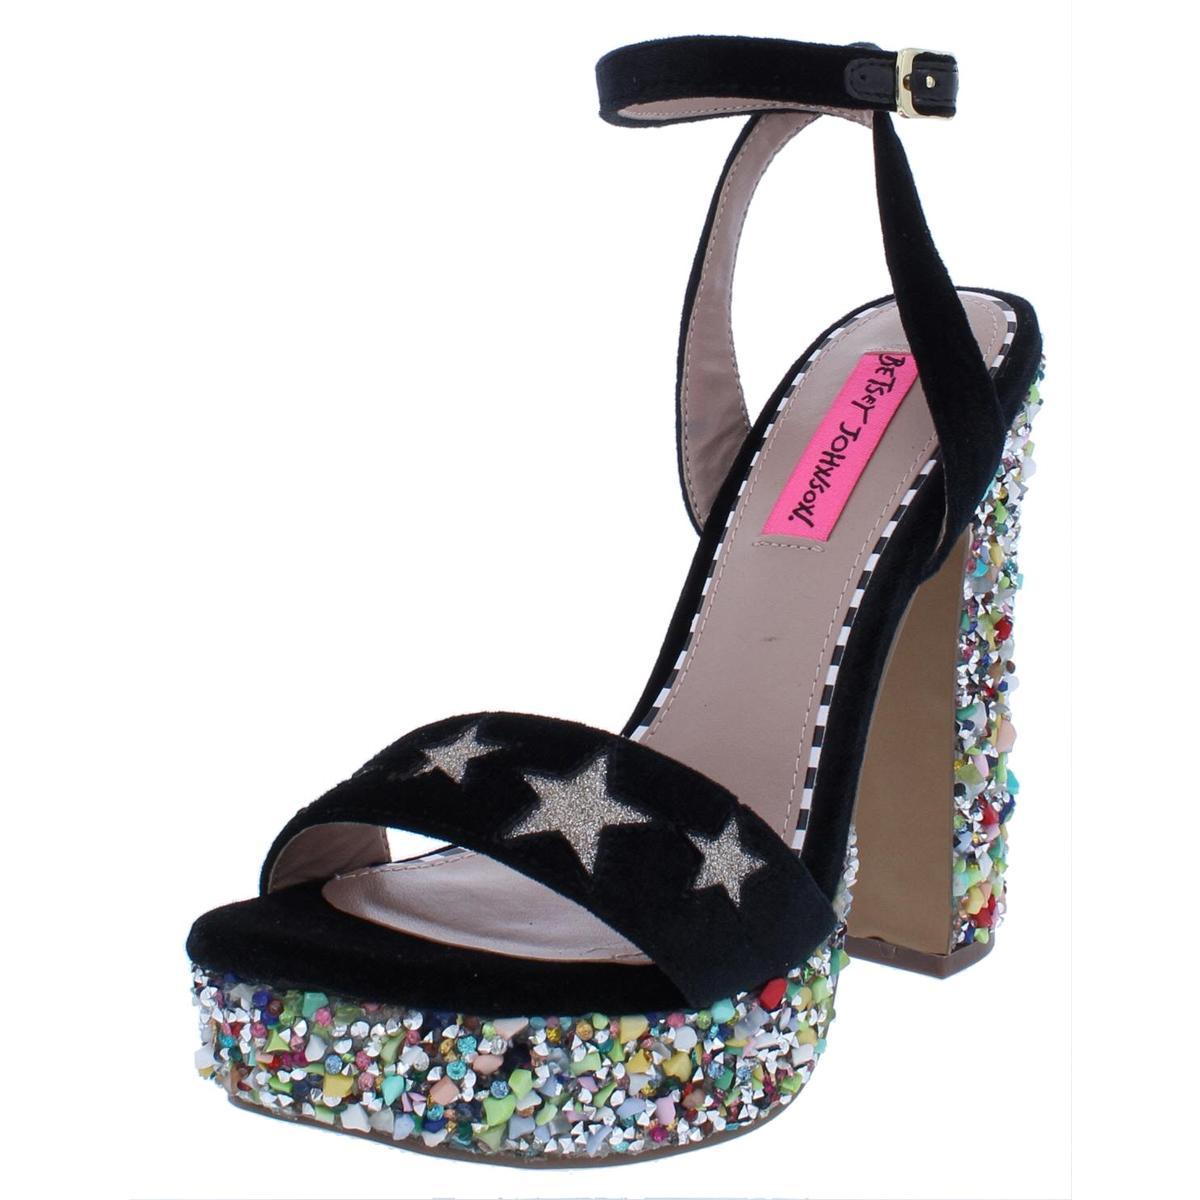 Betsey Johnson Damenschuhe Kenna Embellished Sandales Velvet Platform Sandales Embellished Schuhes BHFO 0600 f7fa23